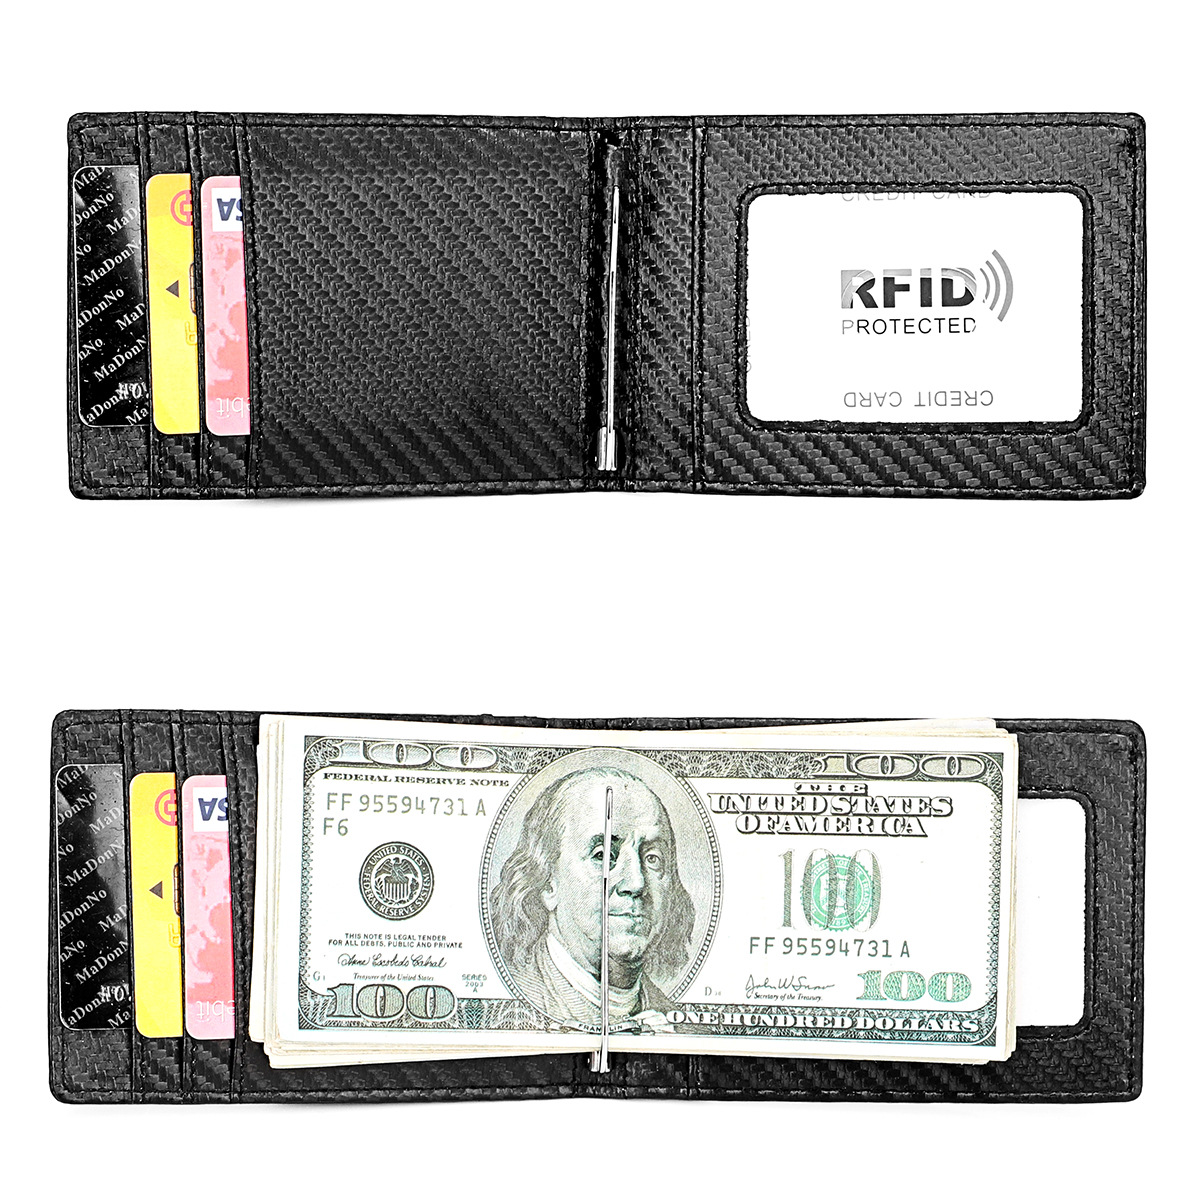 Couro genuíno fino carteira rfid bloqueando carteiras